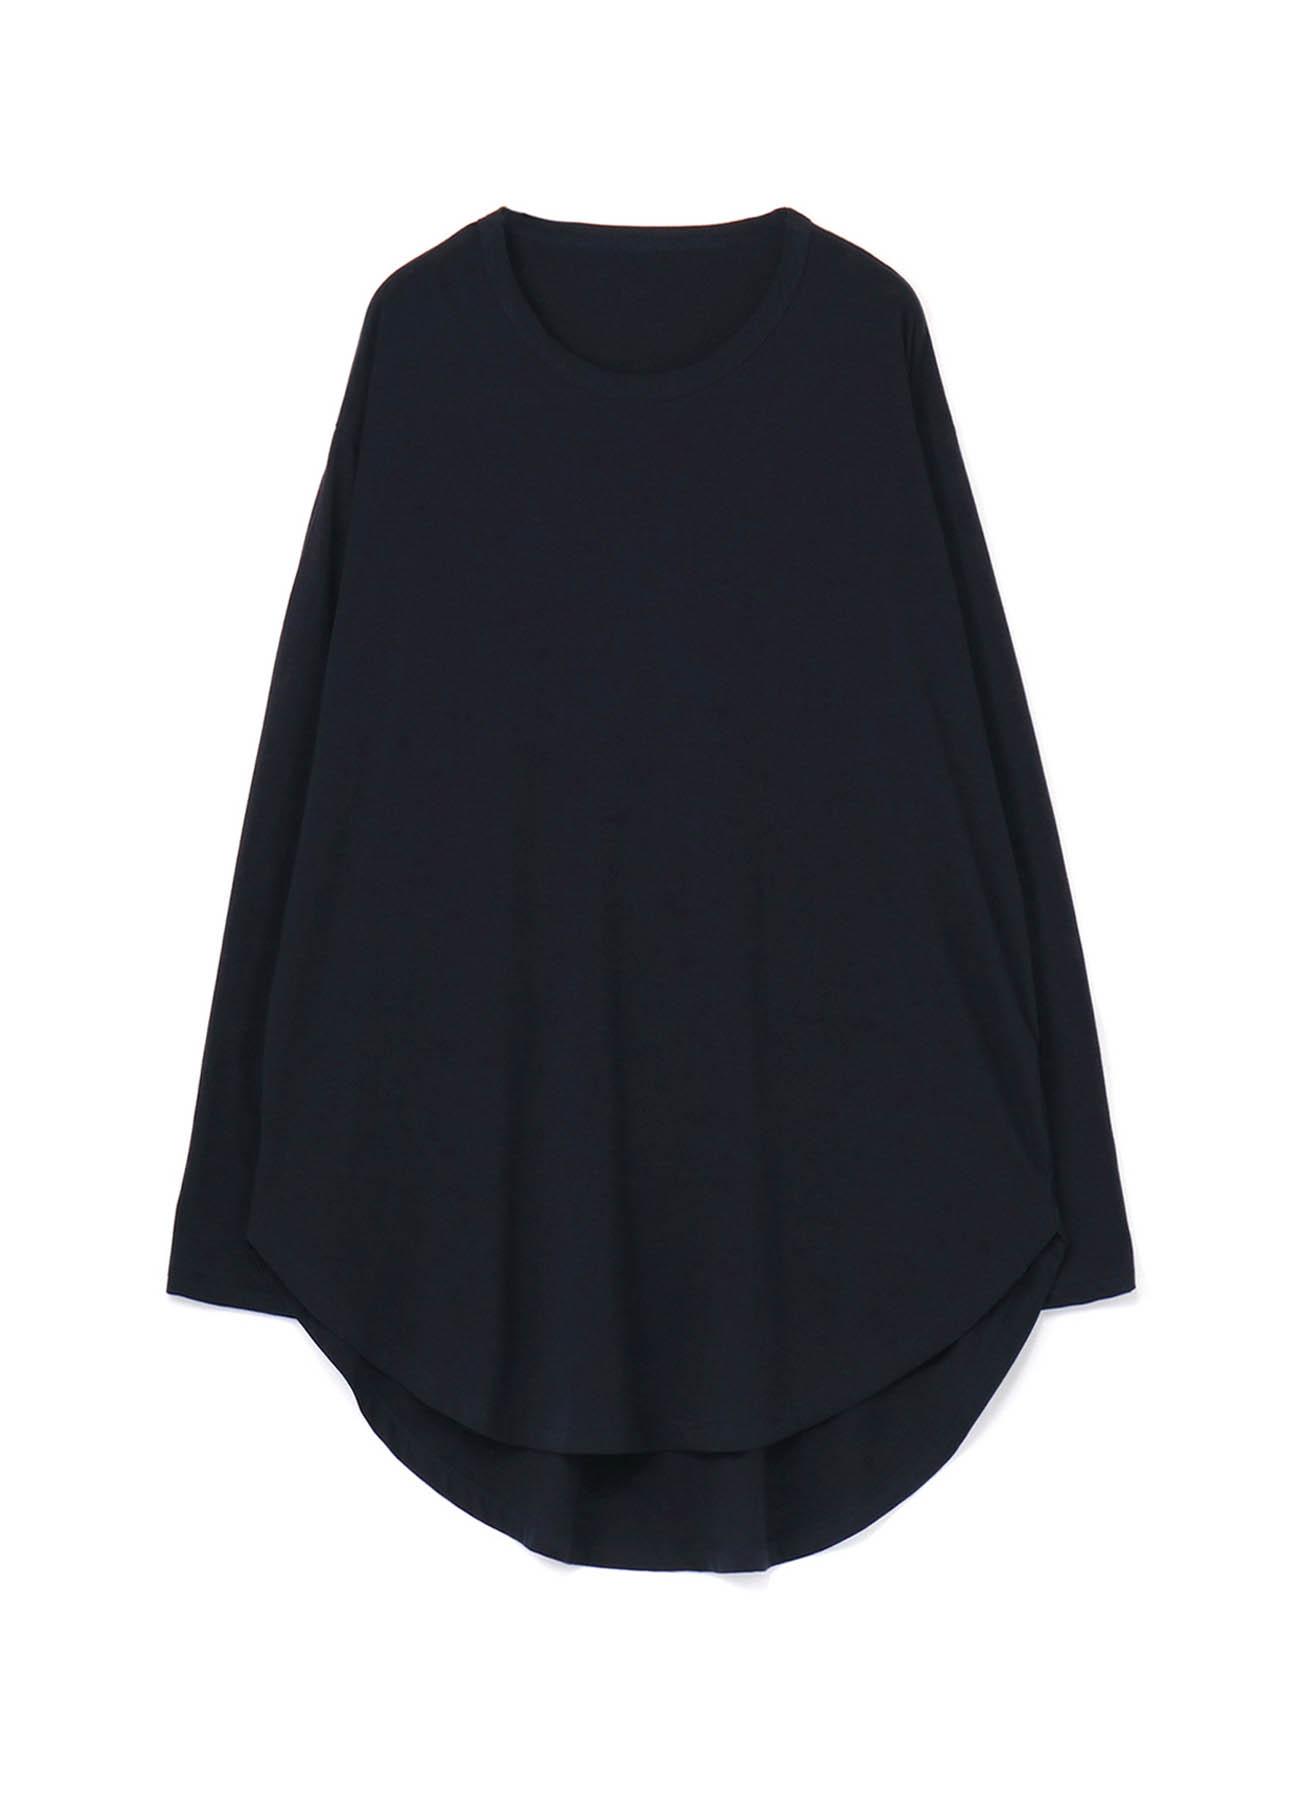 30/Cotton Jersey Jumbo Round Long Sleeves Cut Sew